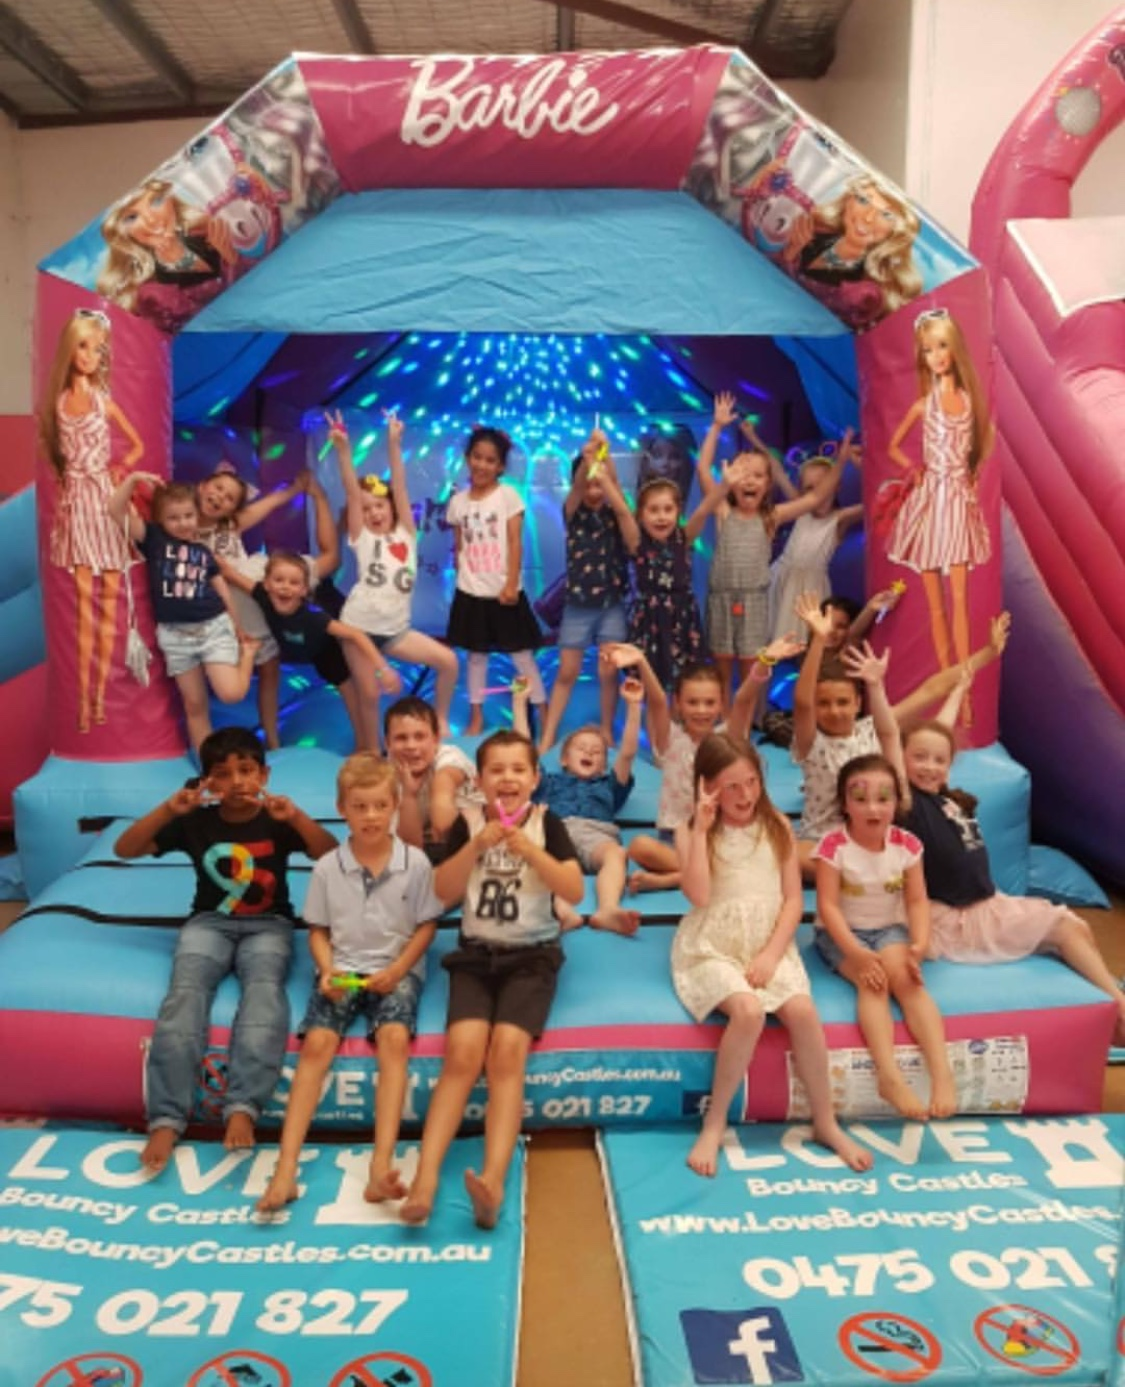 event hire for dance studio in rockingham,6168,WA